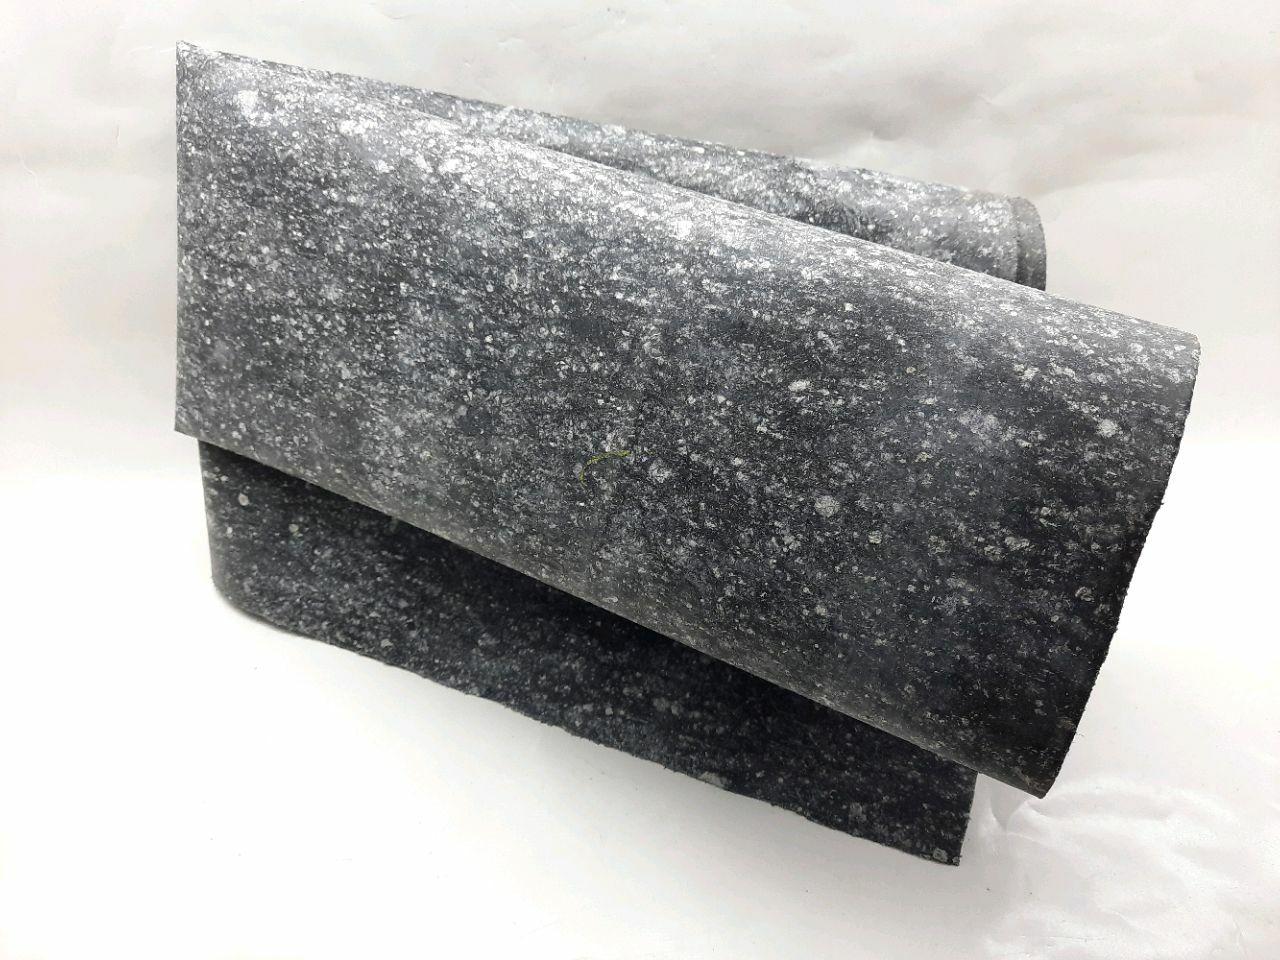 Paronit rezistent ulei/combustibil 1.5 mm (kg) VATI